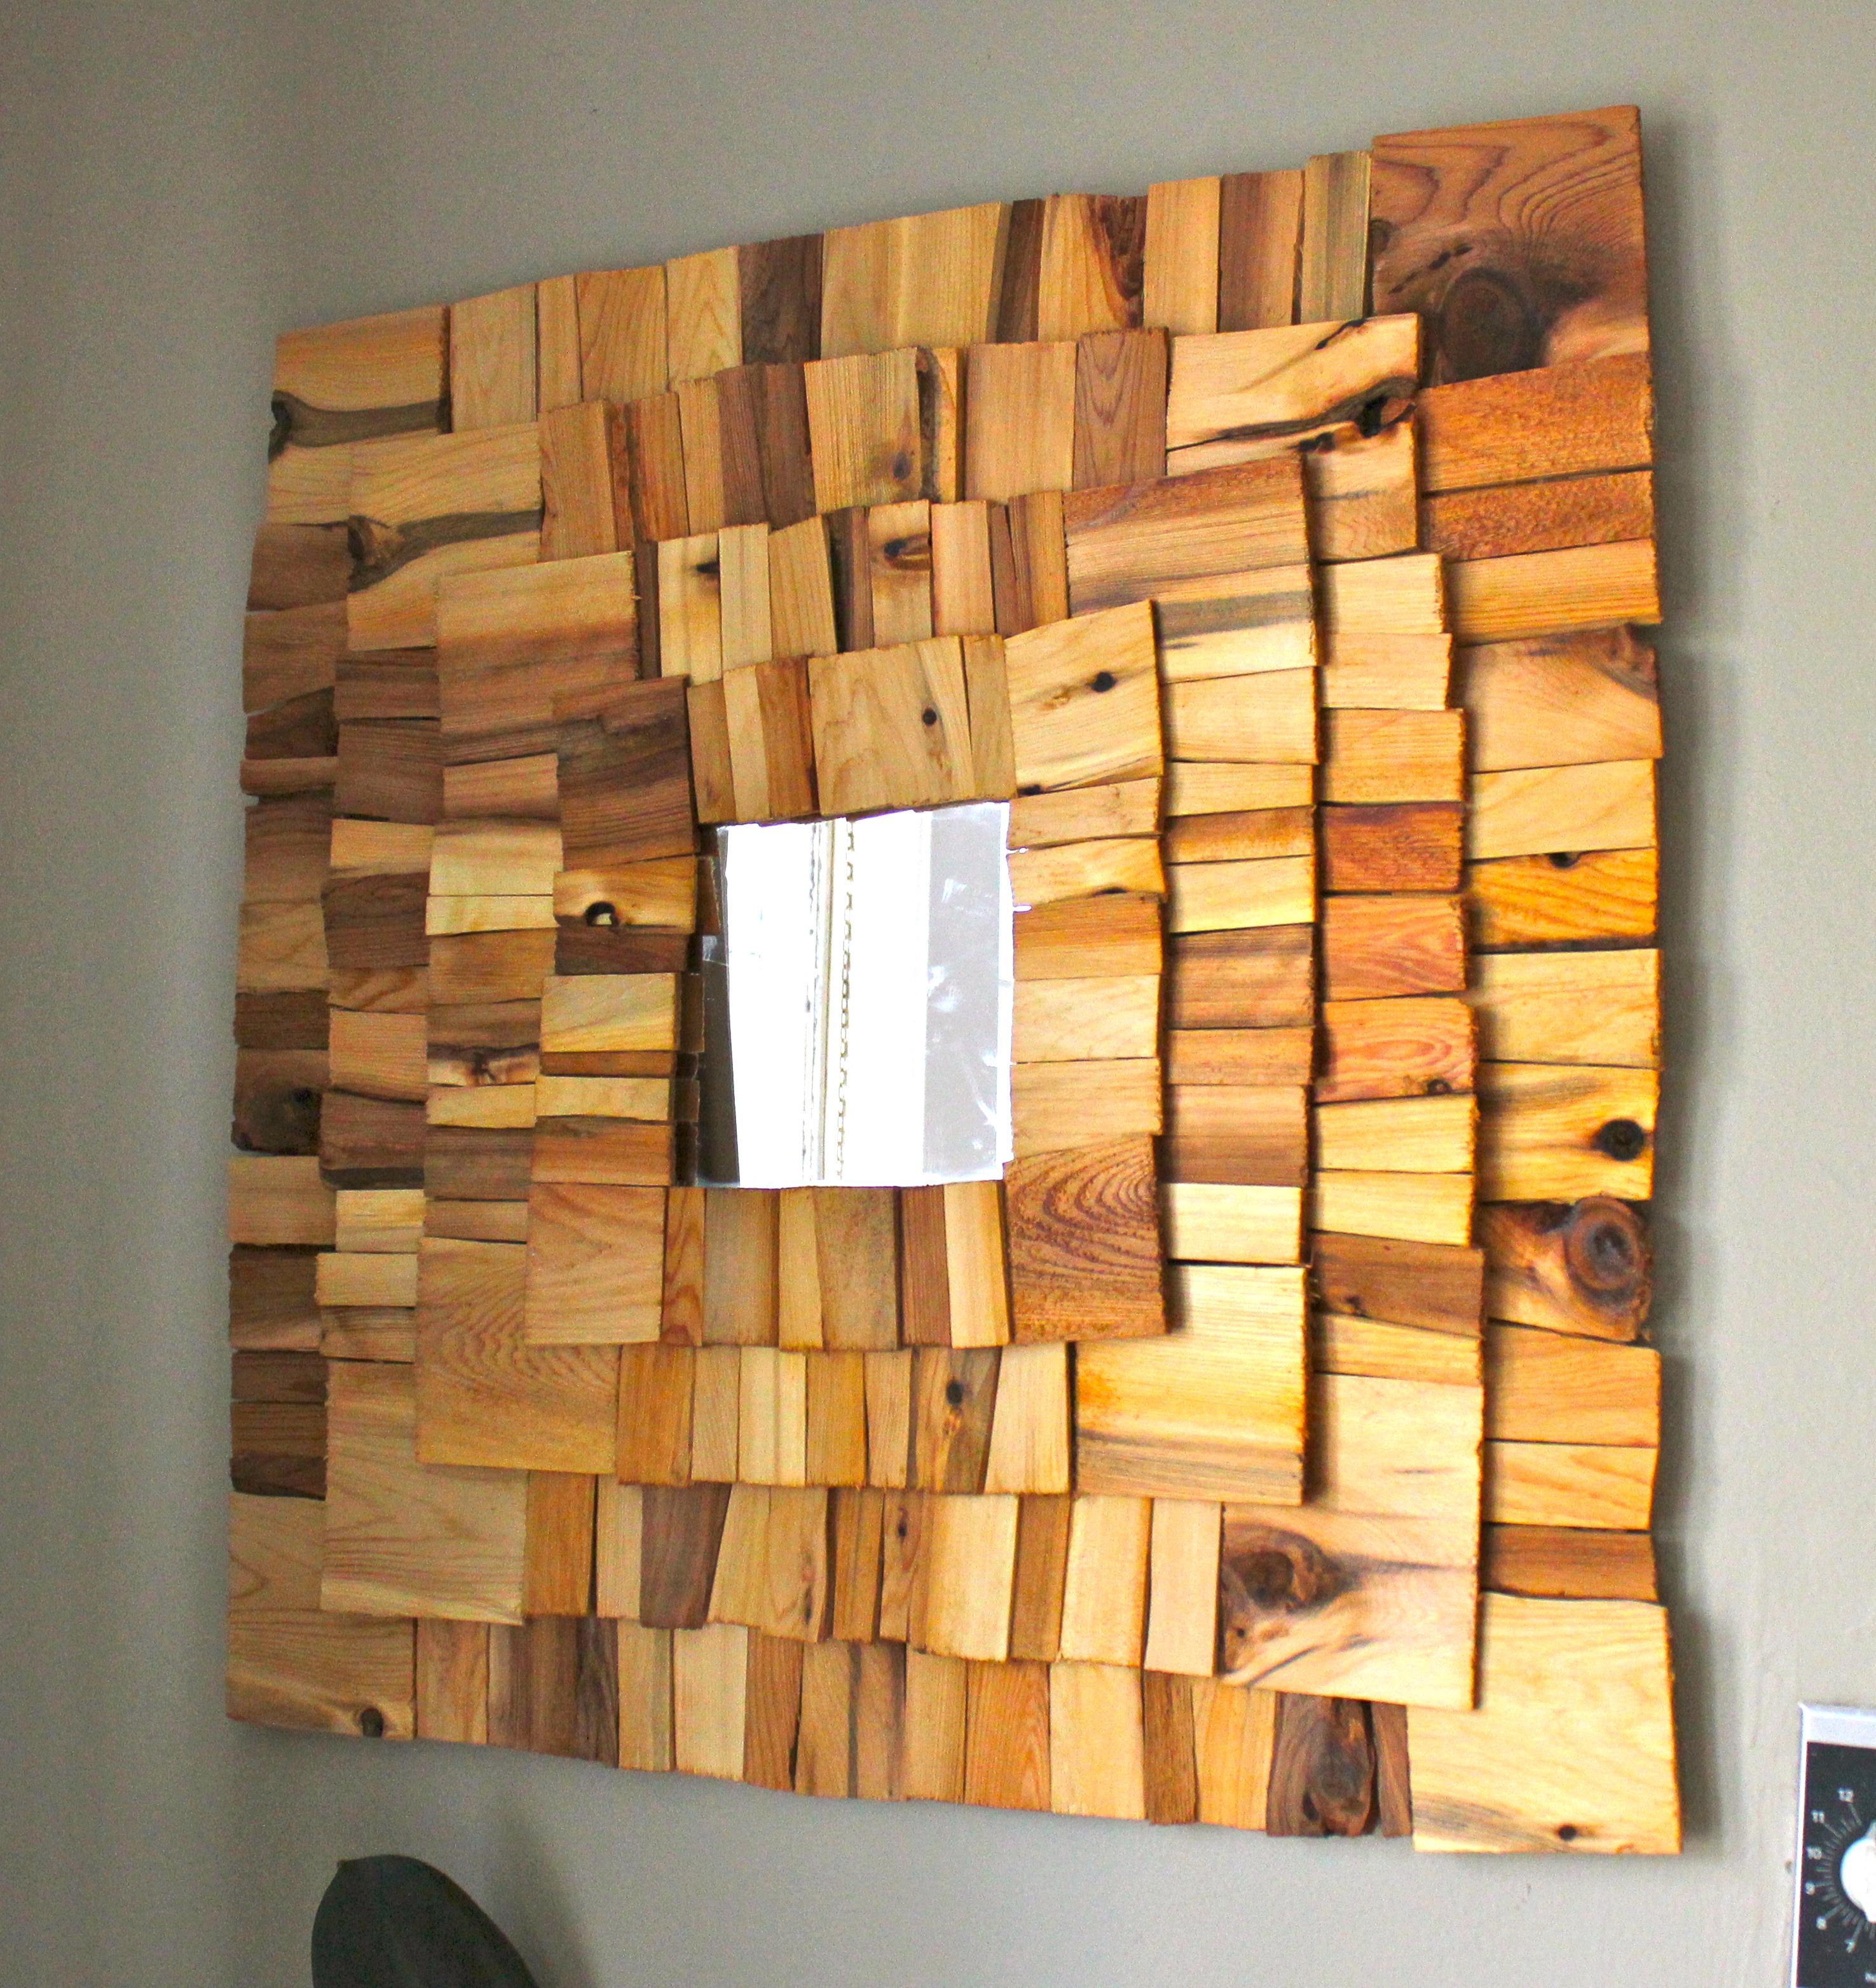 10 diy cool mirror ideas for Wood plank art ideas